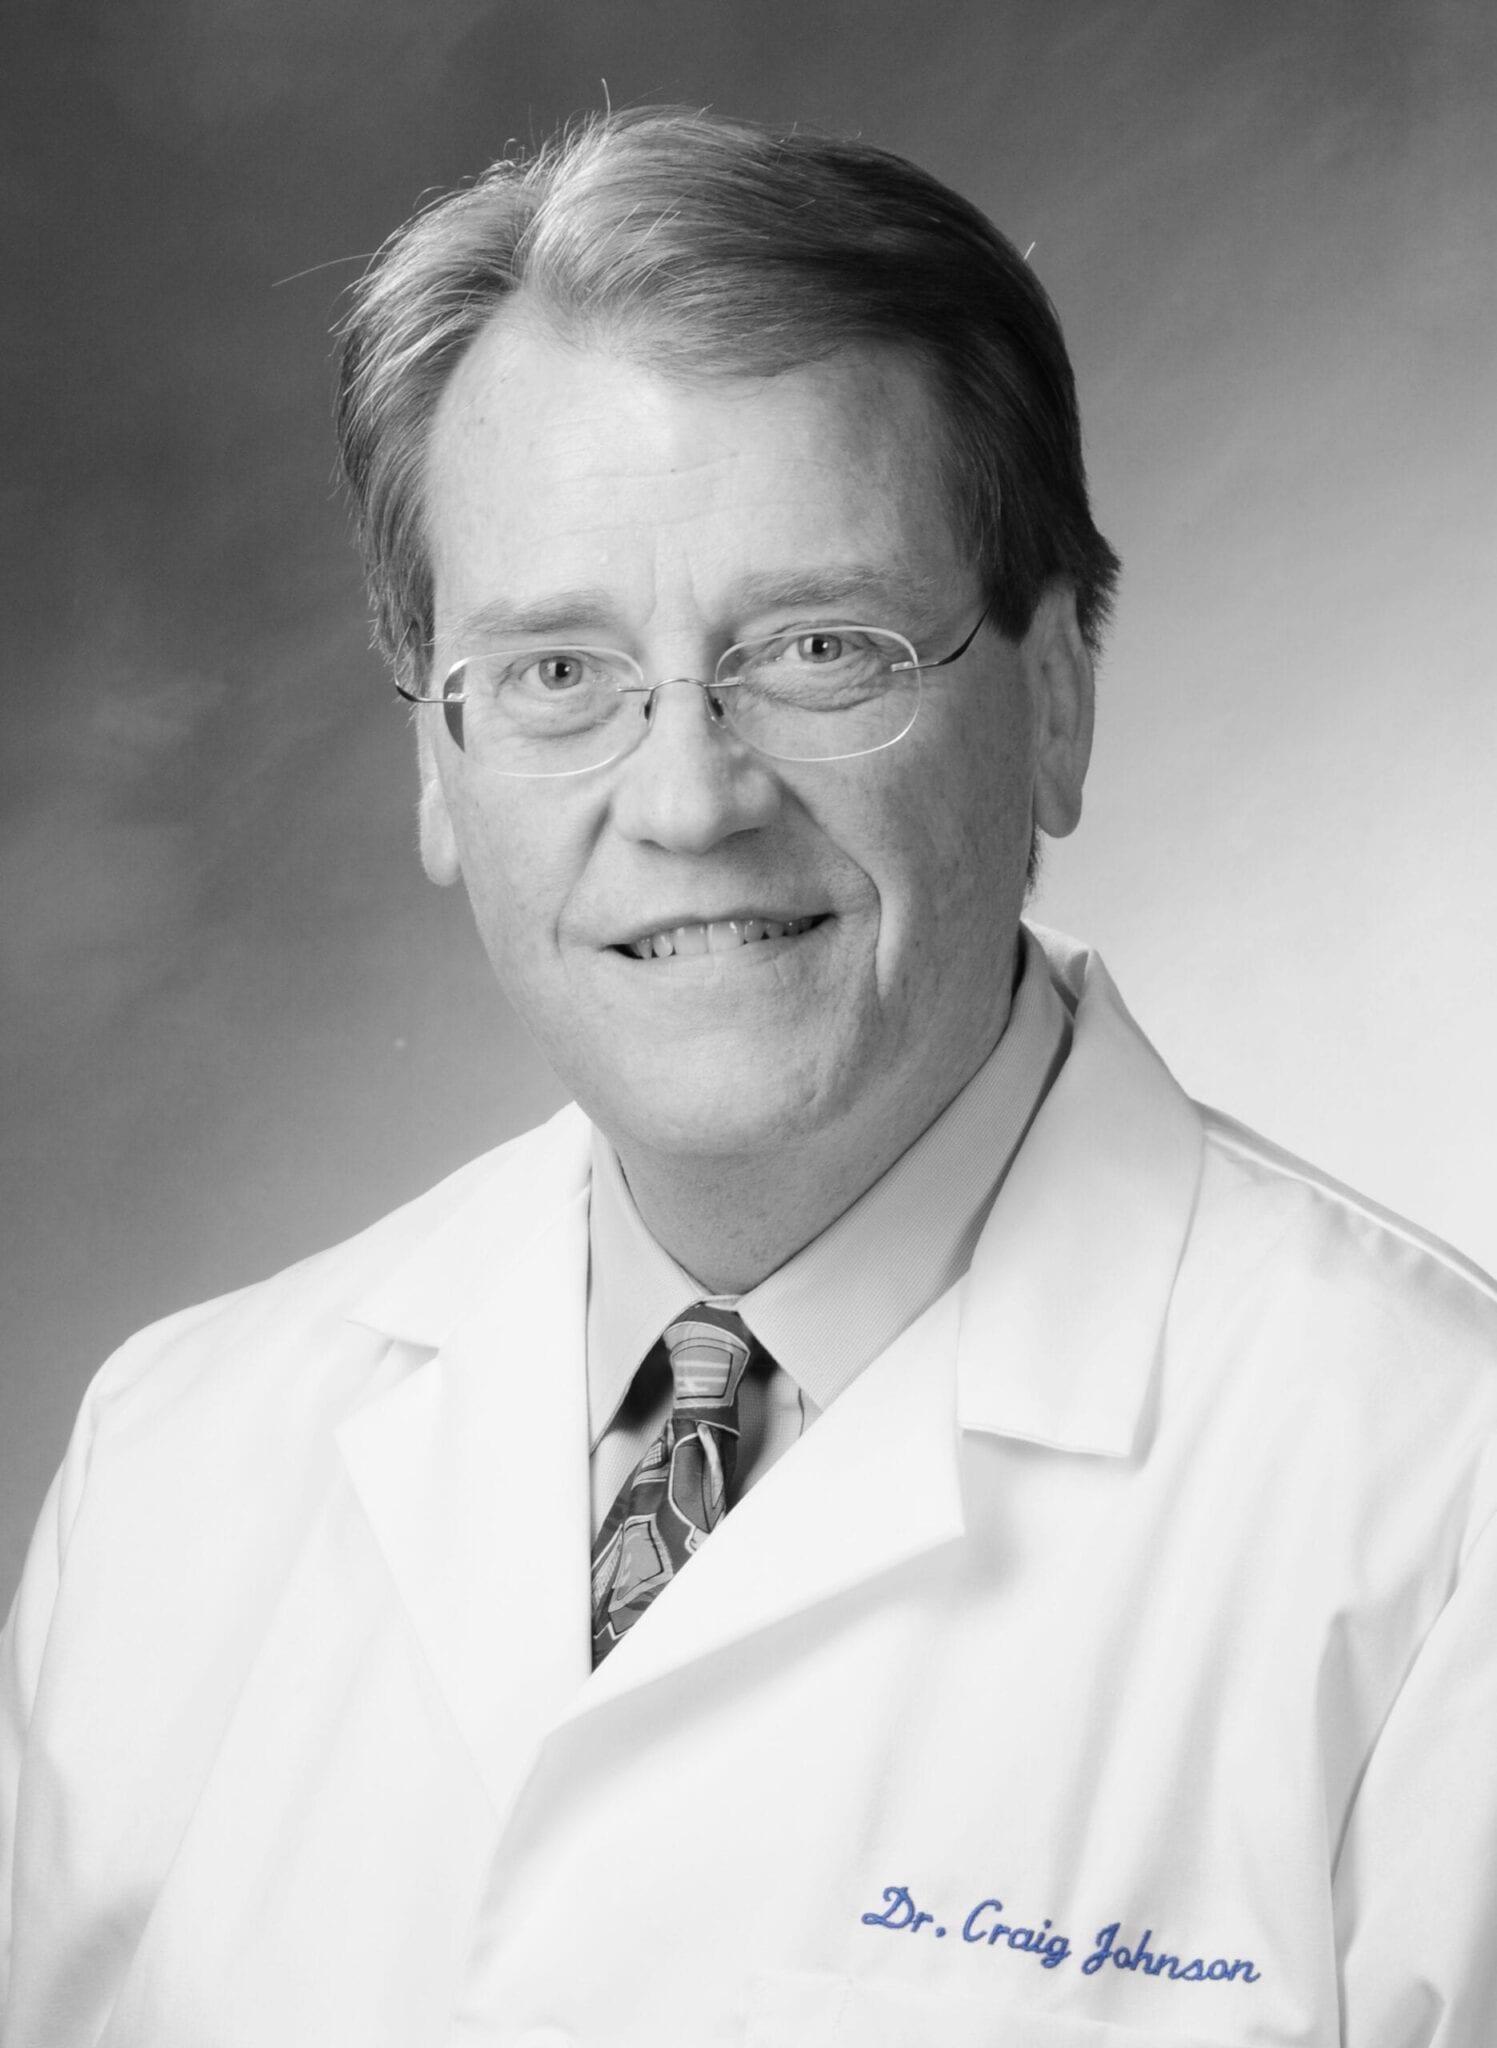 Dr. Craig Johnson